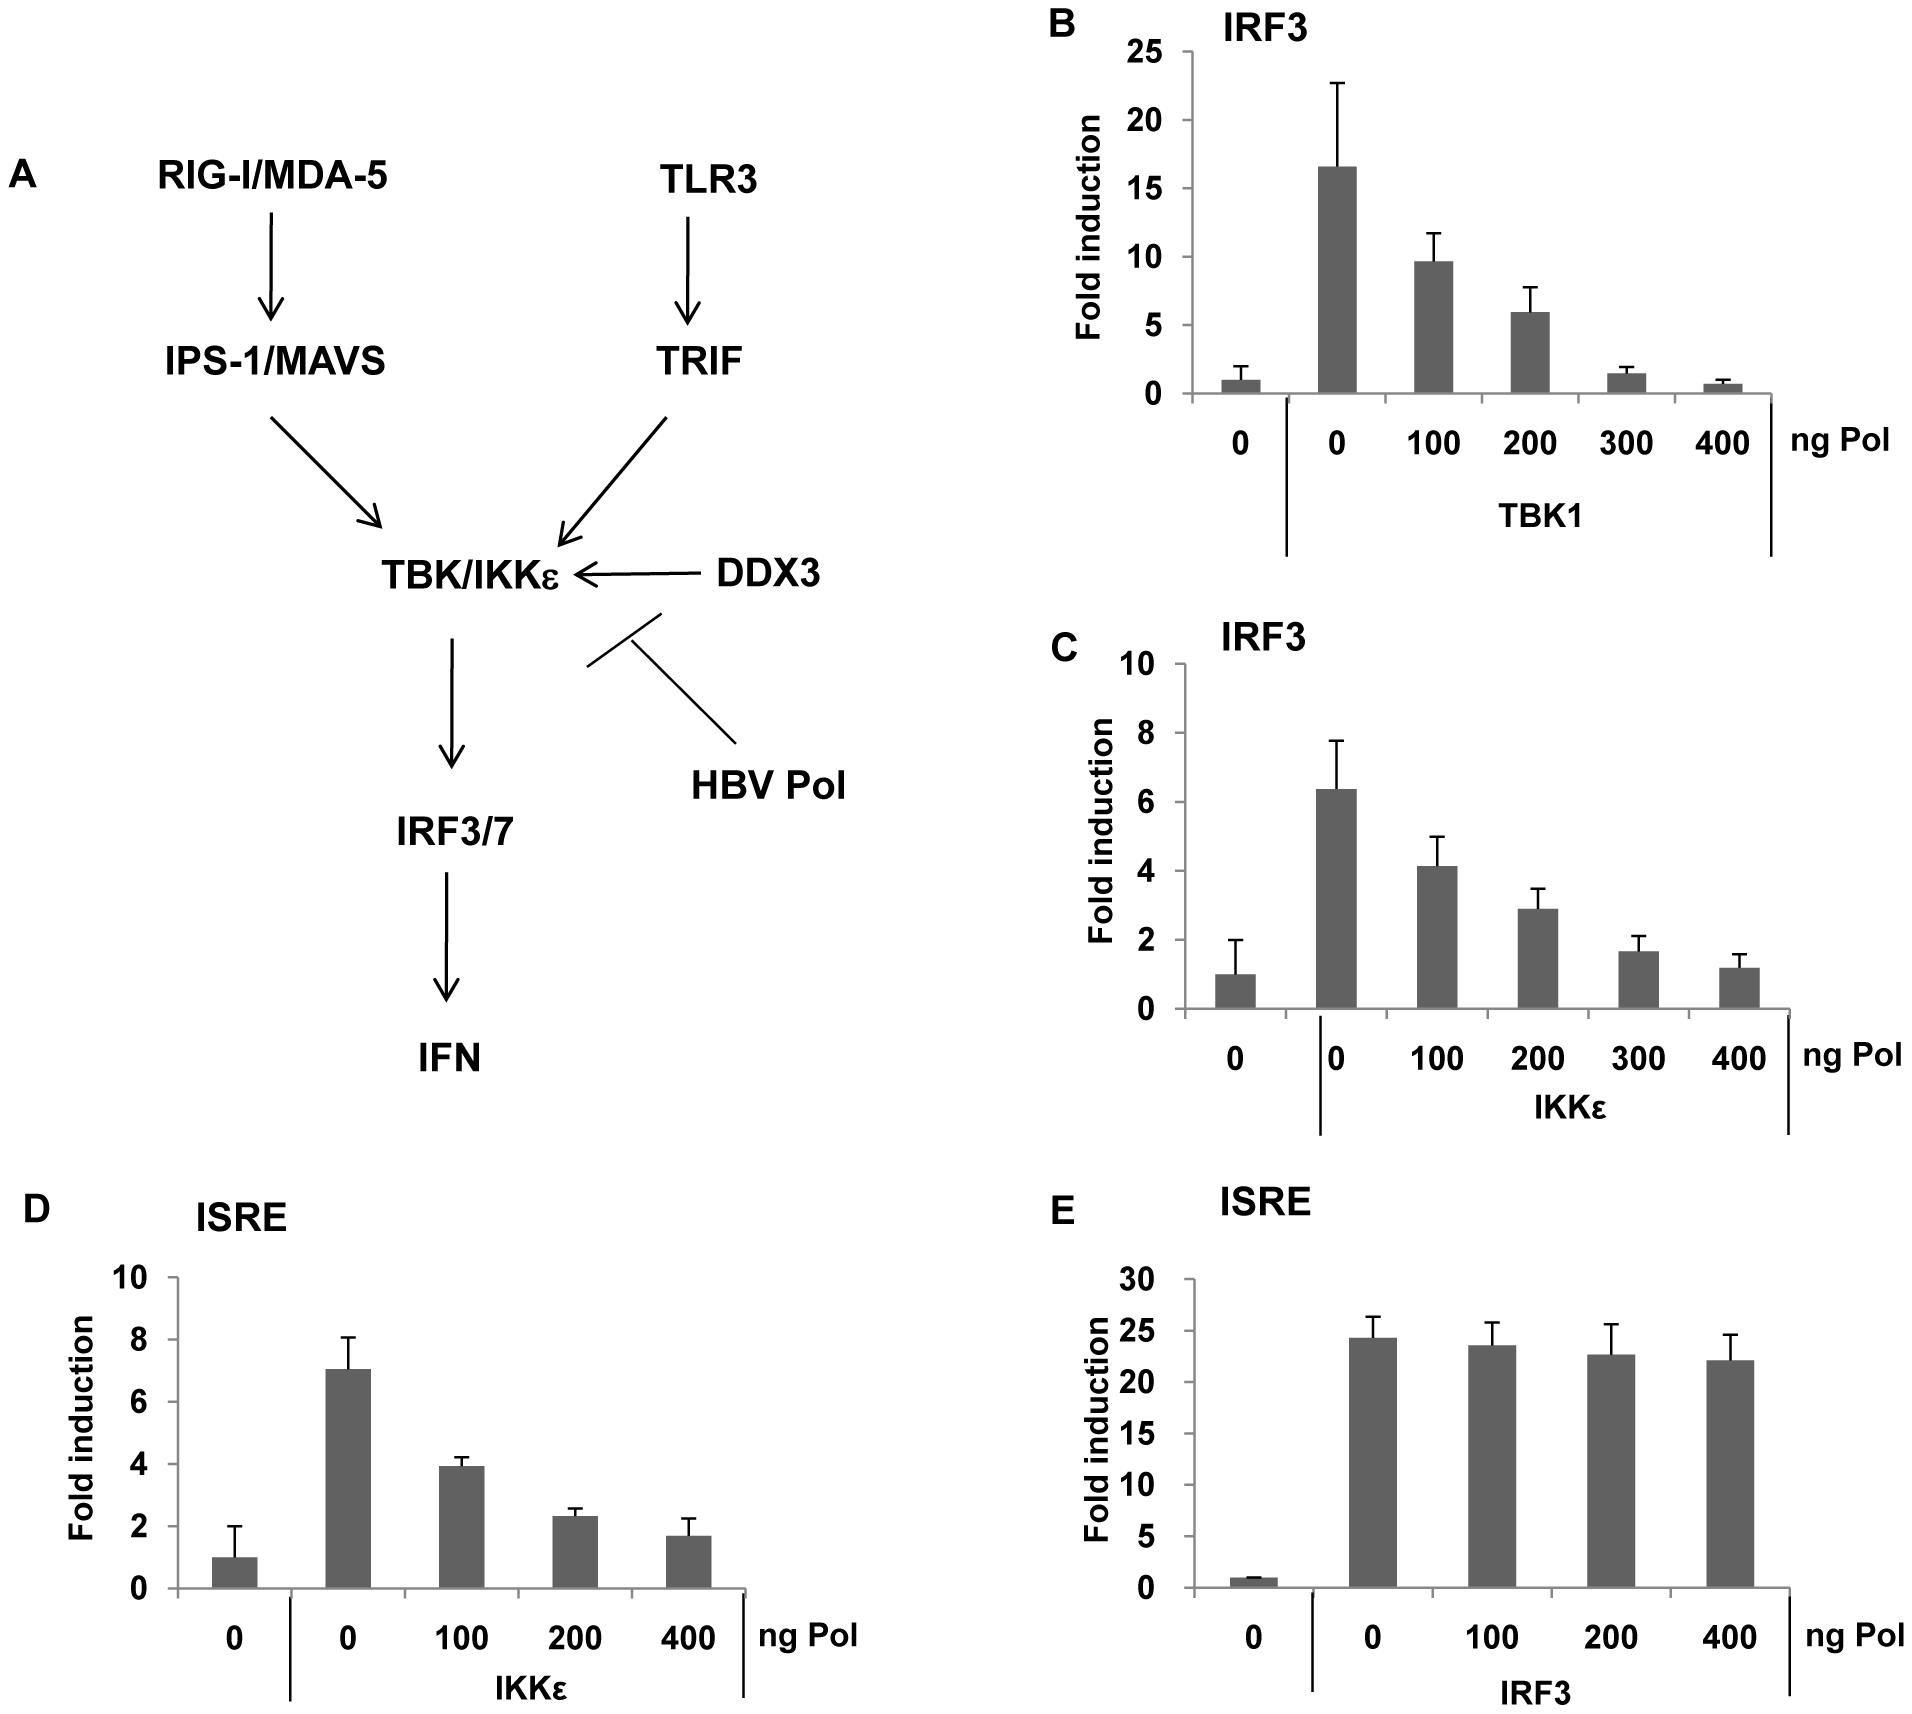 HBV Pol blocks IRF activation by inhibiting TBK1/IKKε activity.